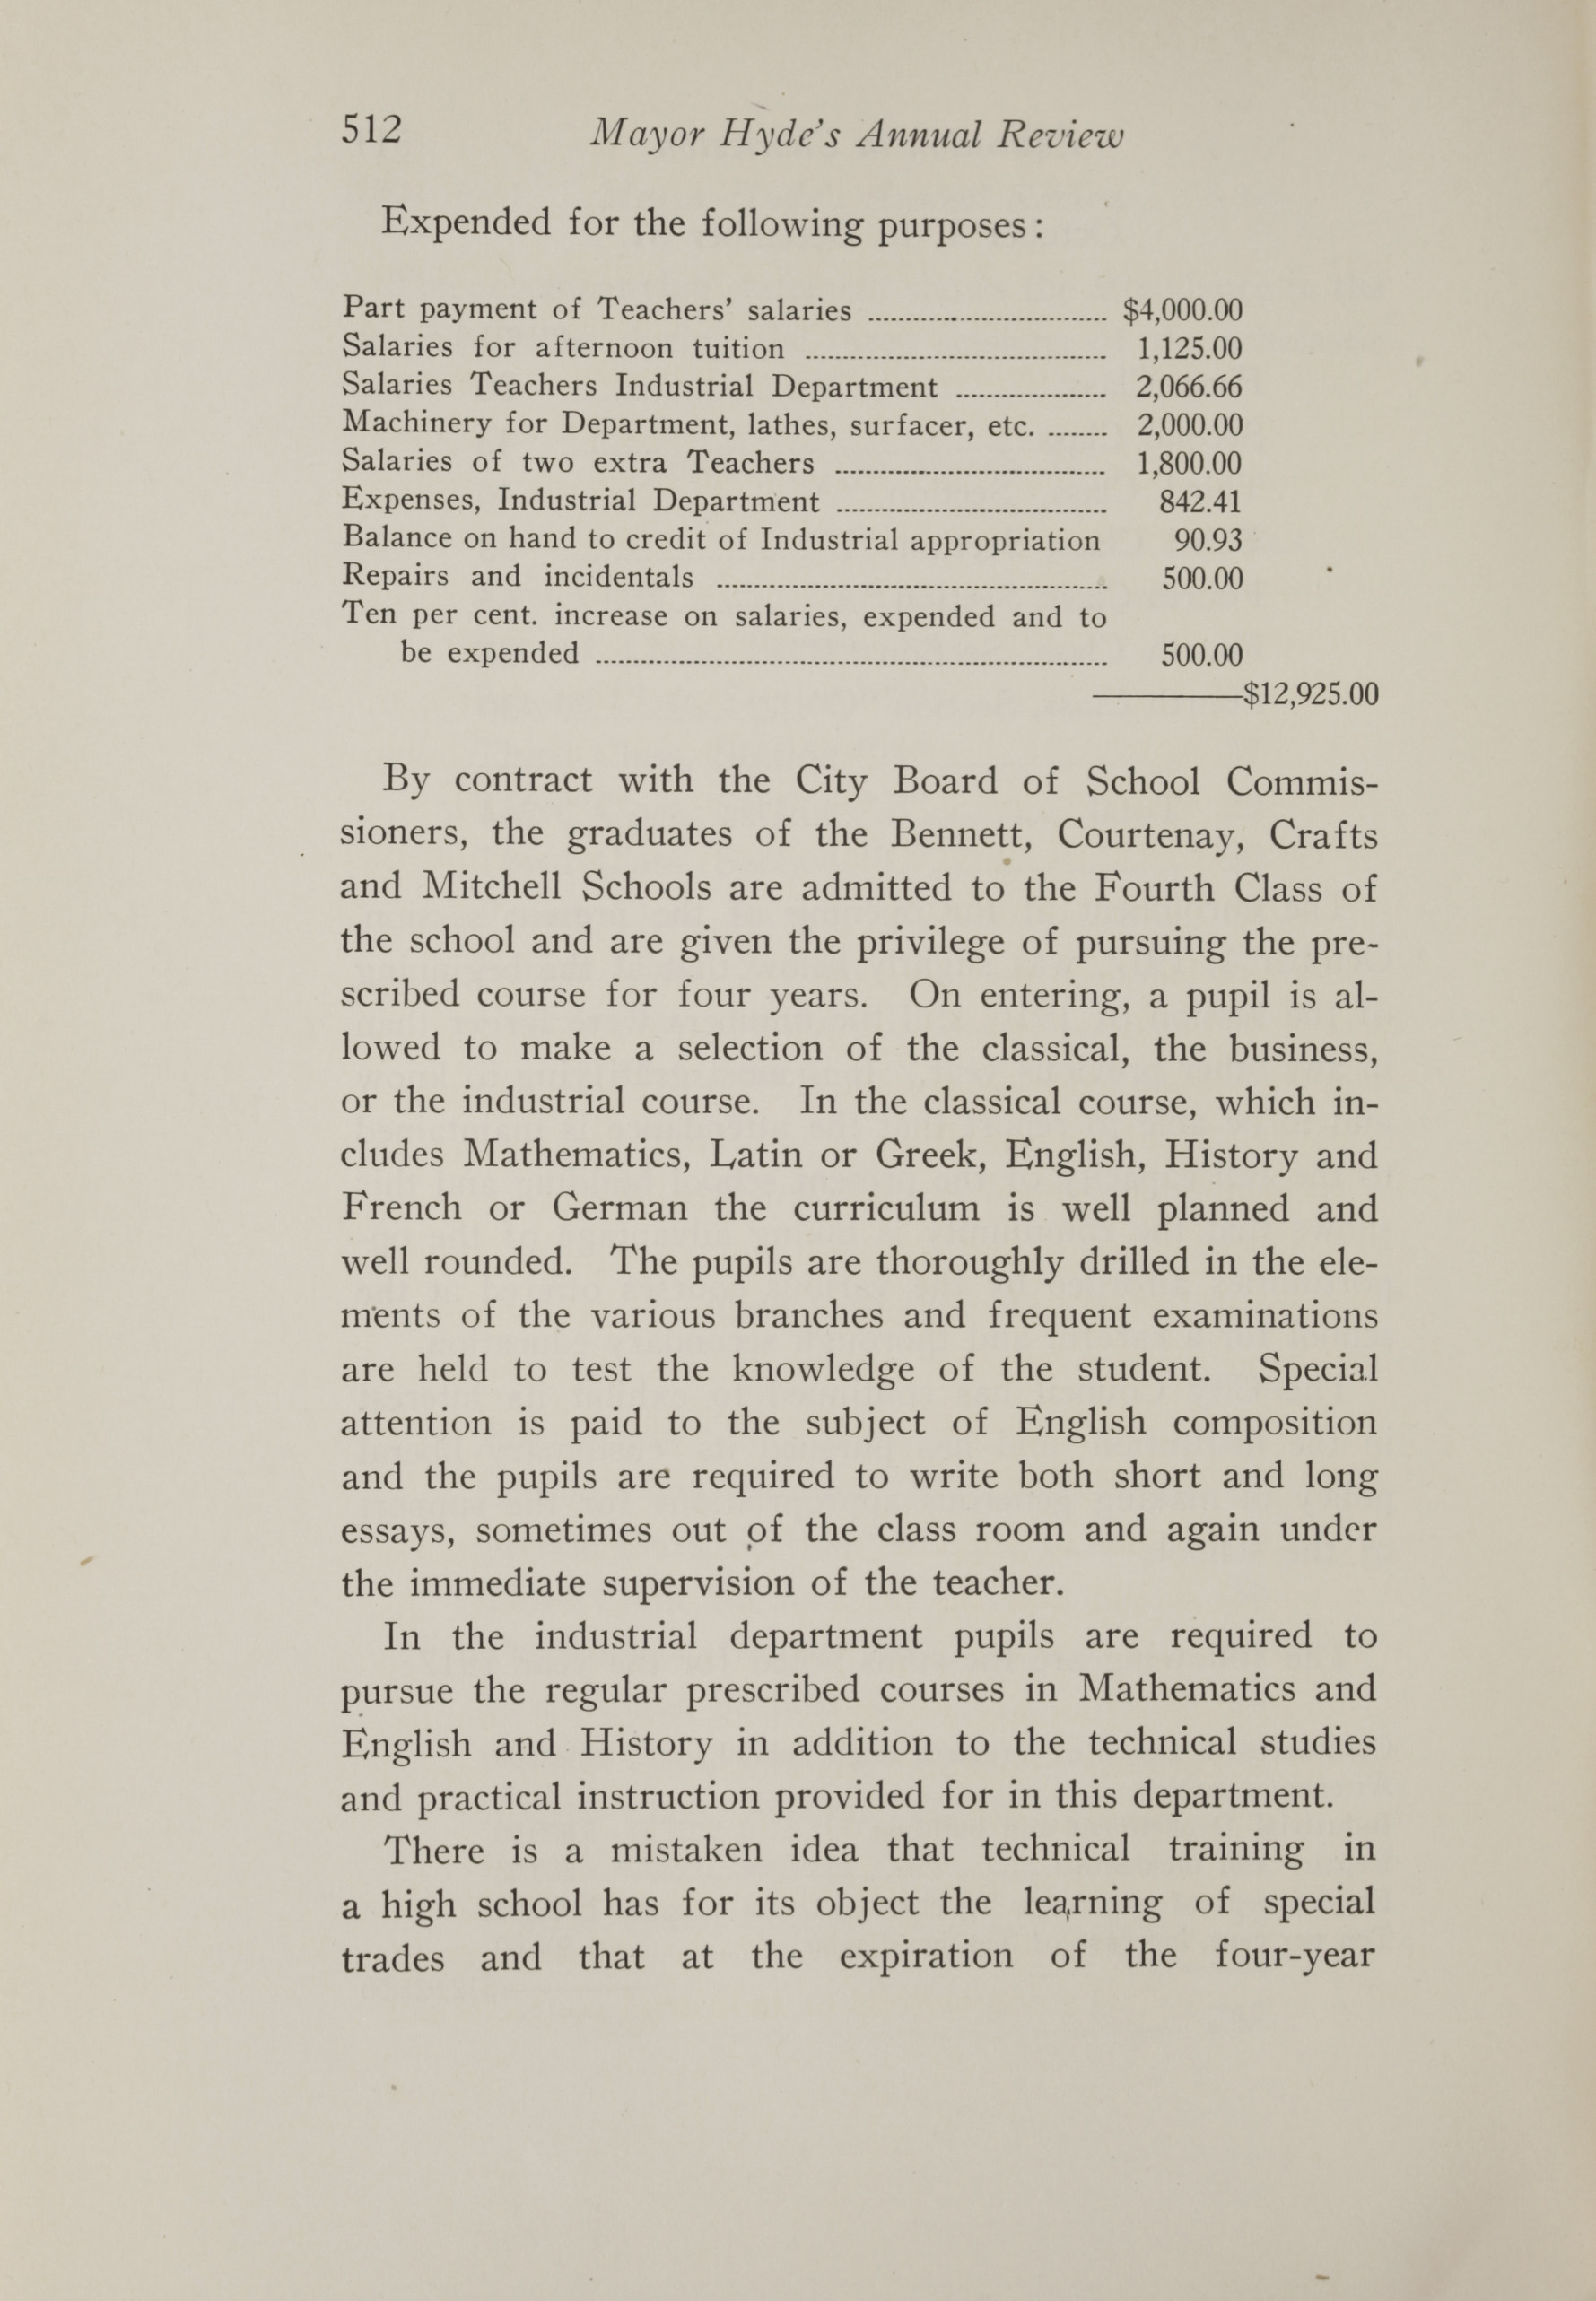 Charleston Yearbook, 1917, page 512